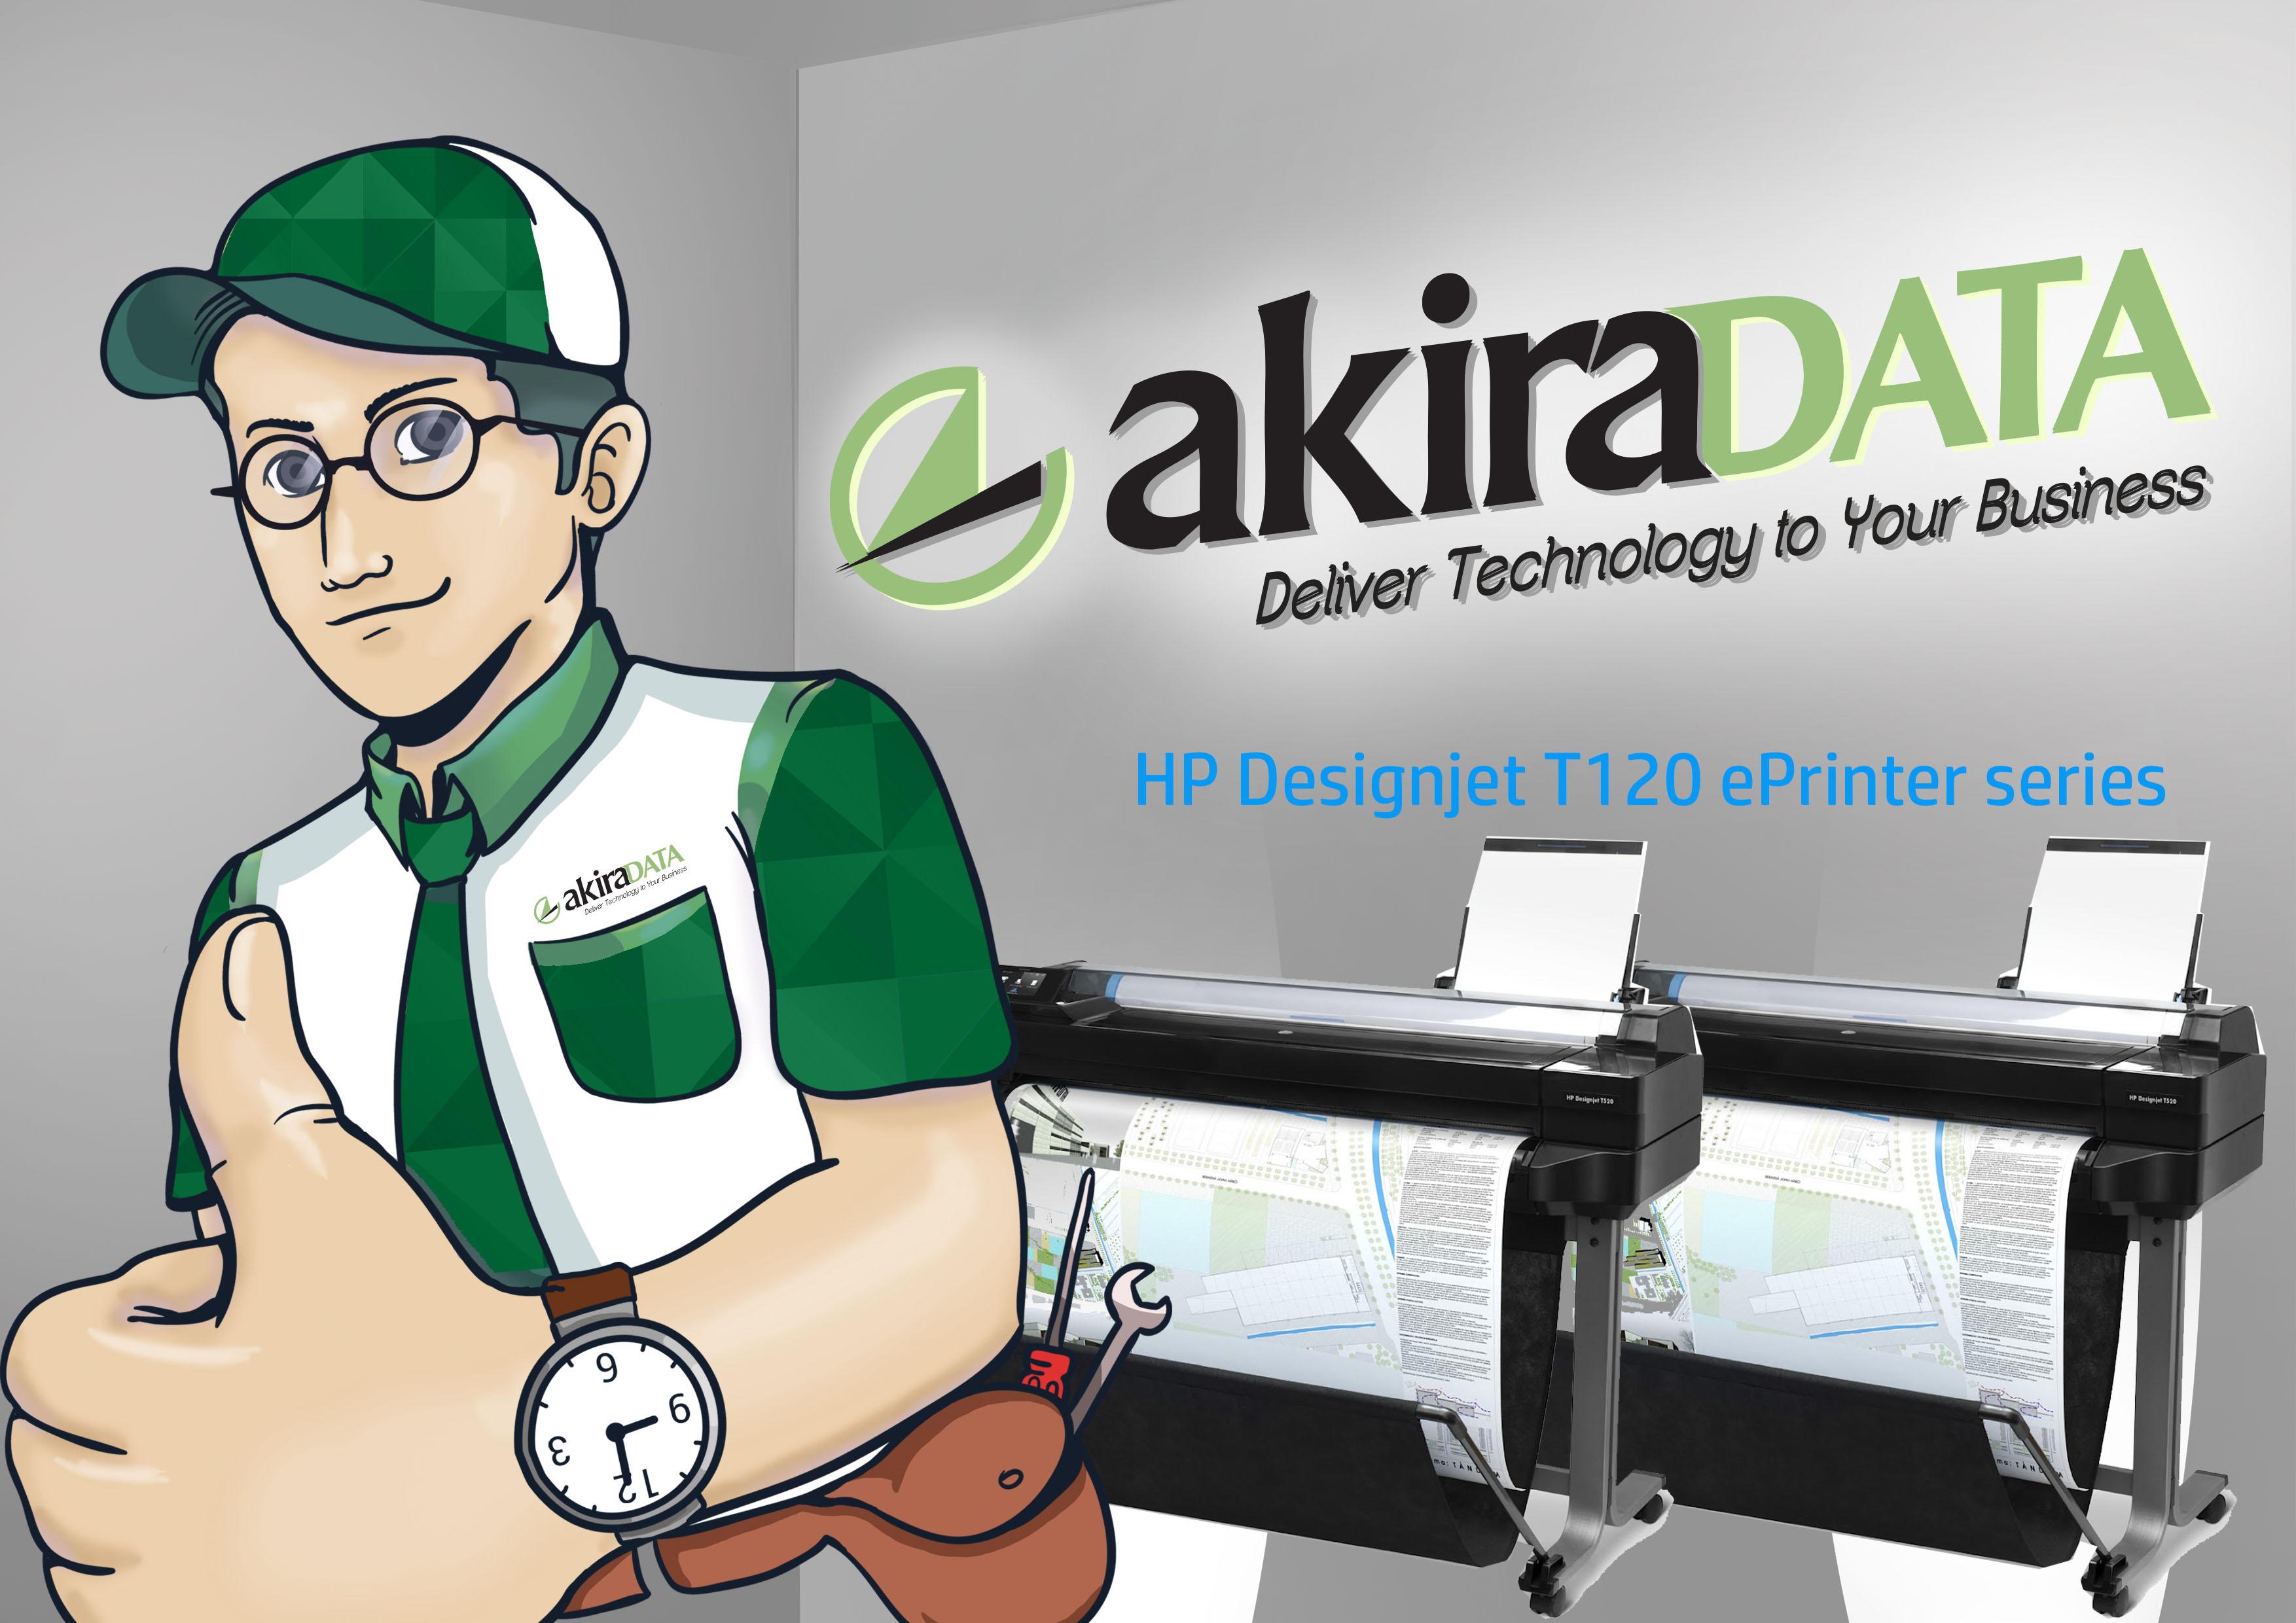 service plotter HP Designjet T520 ePrinter series